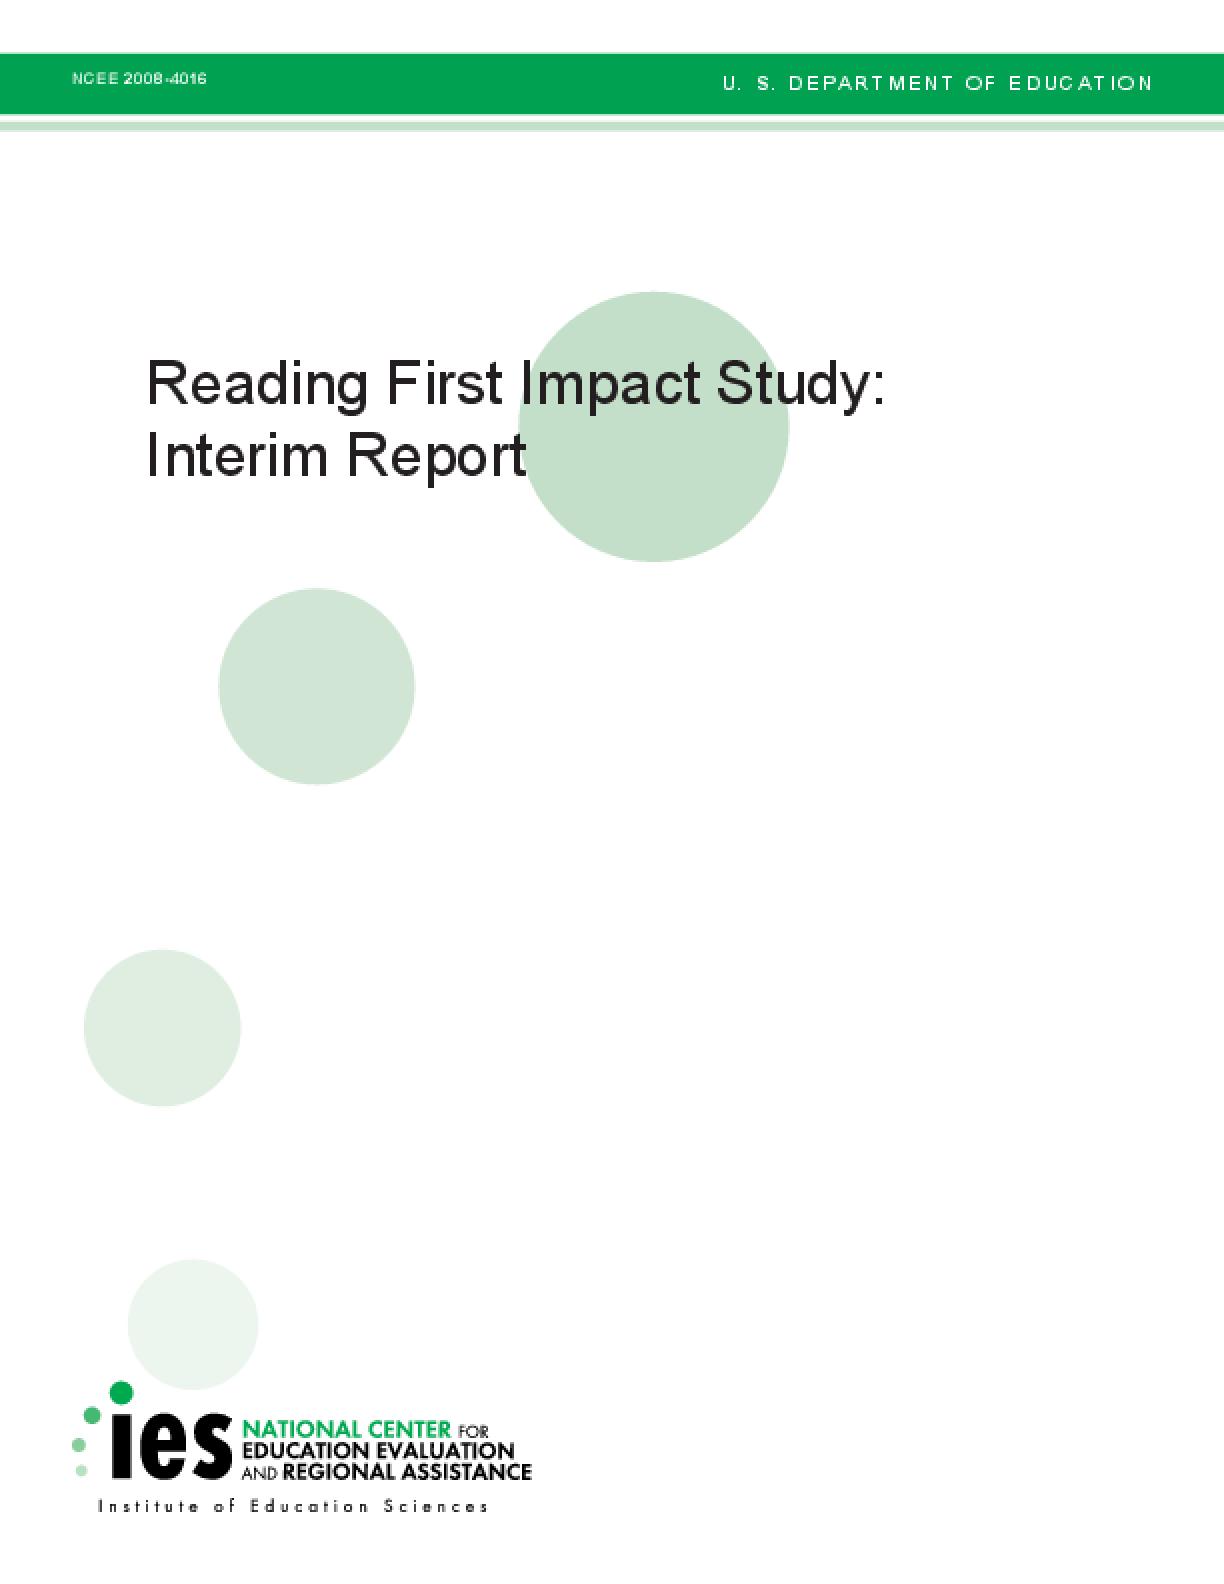 Reading First Impact Study: Interim Report